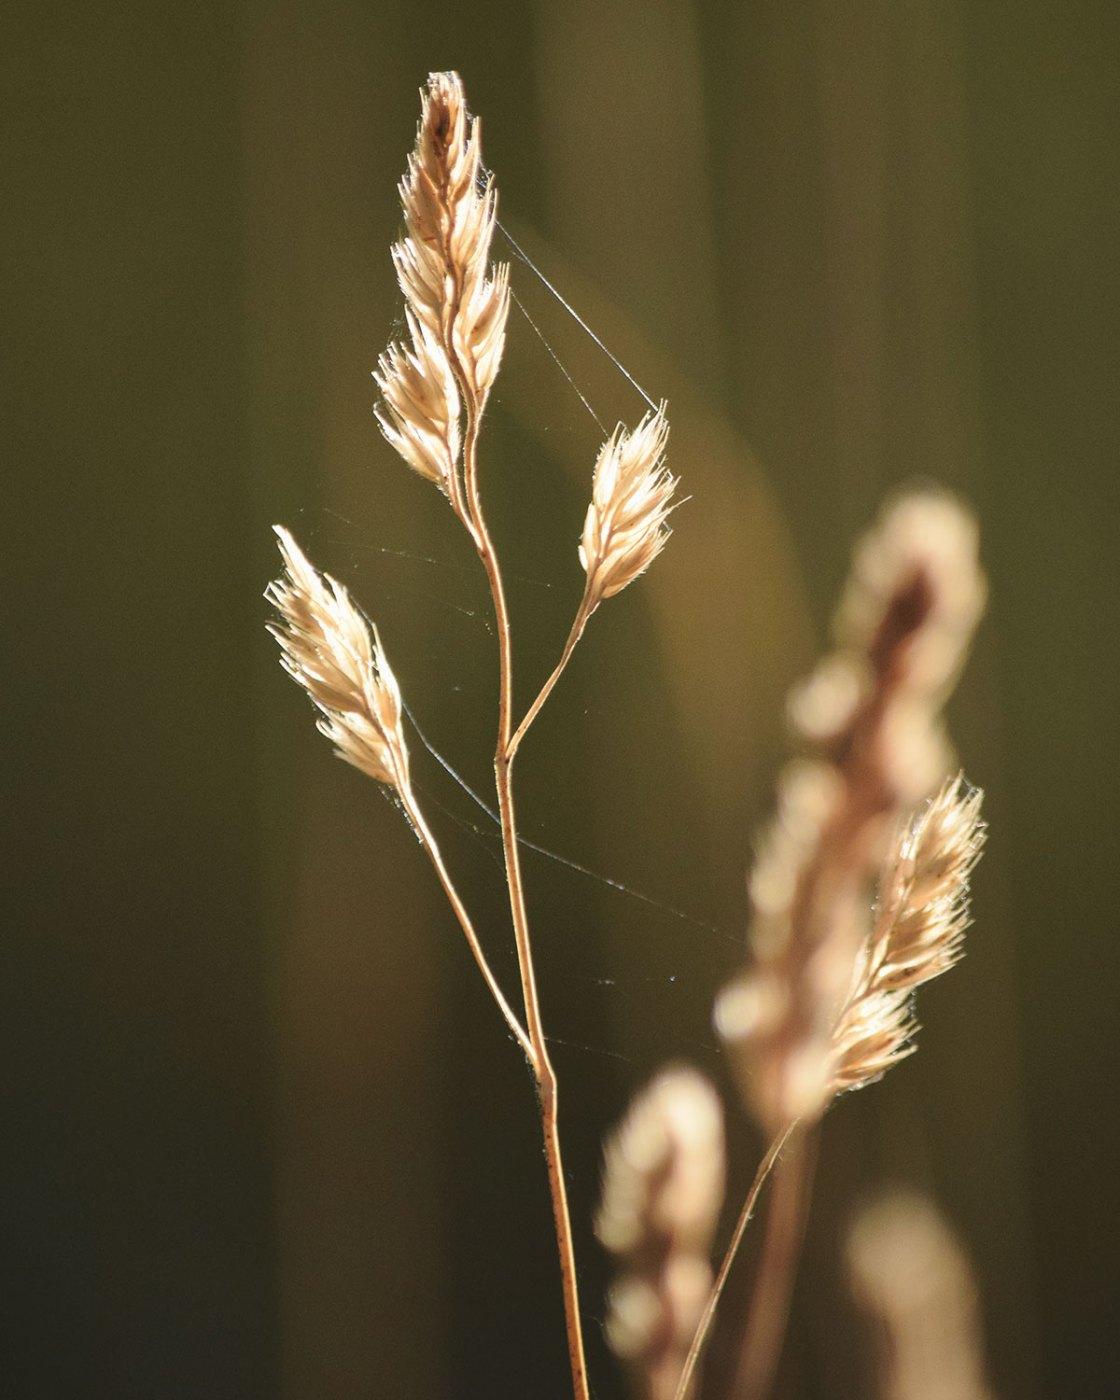 Dry grasses